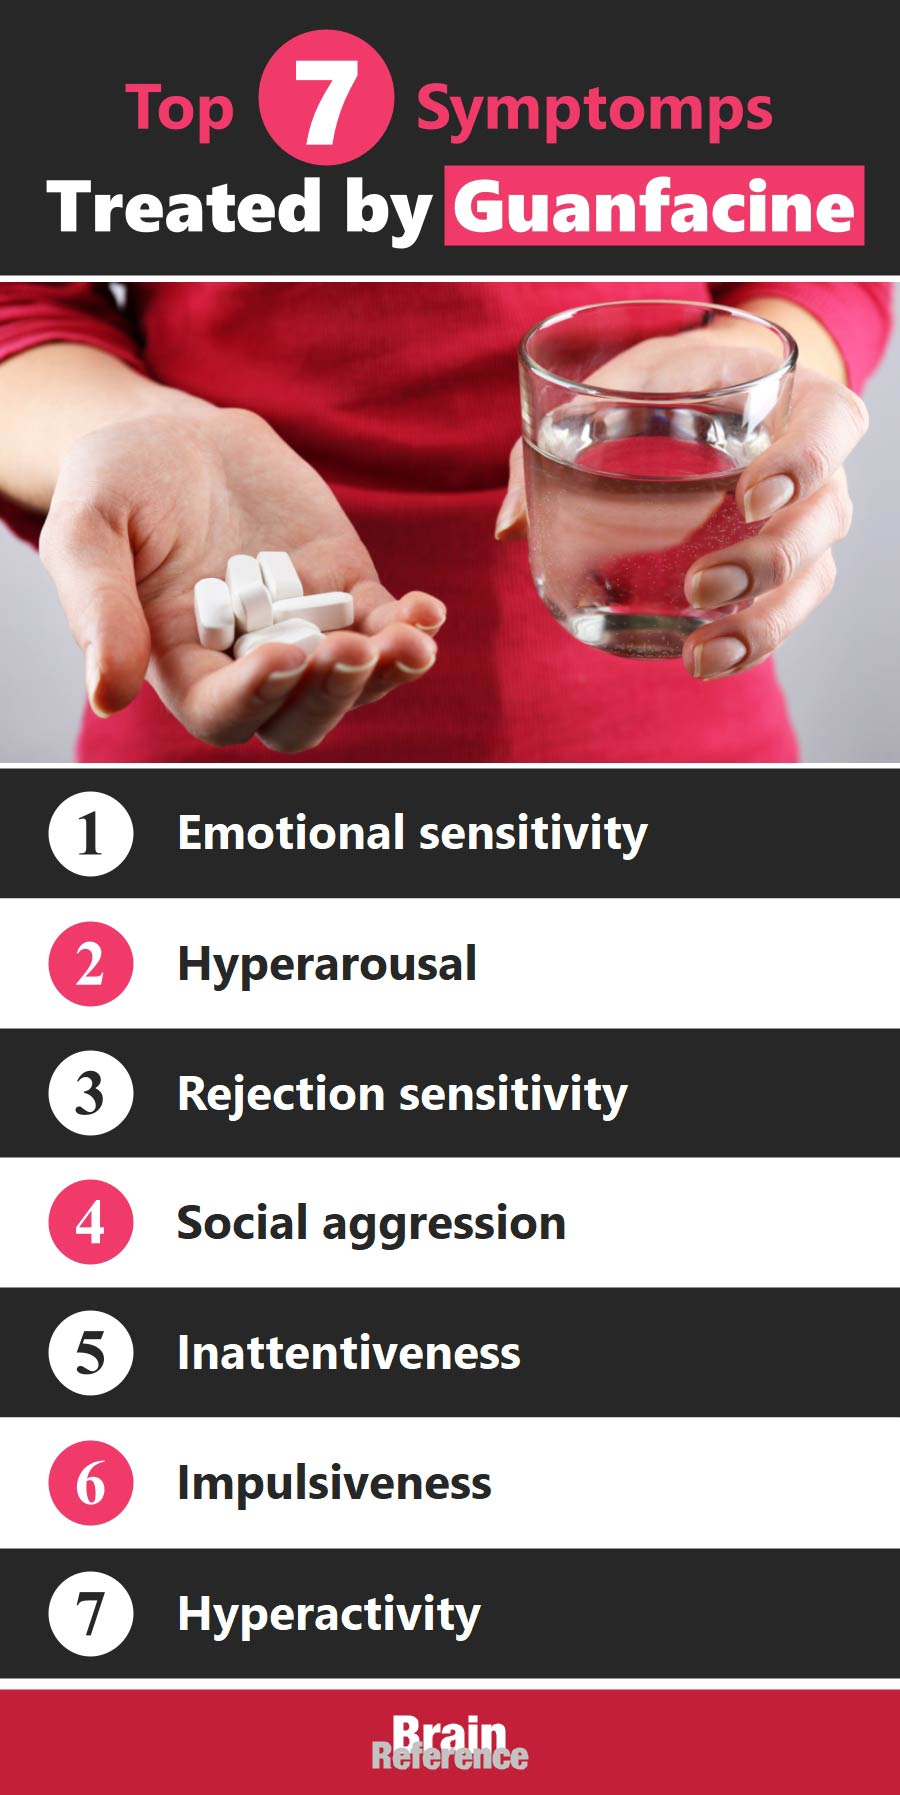 Intuniv-Guanfacine-Sandoz-Treated-Symptoms